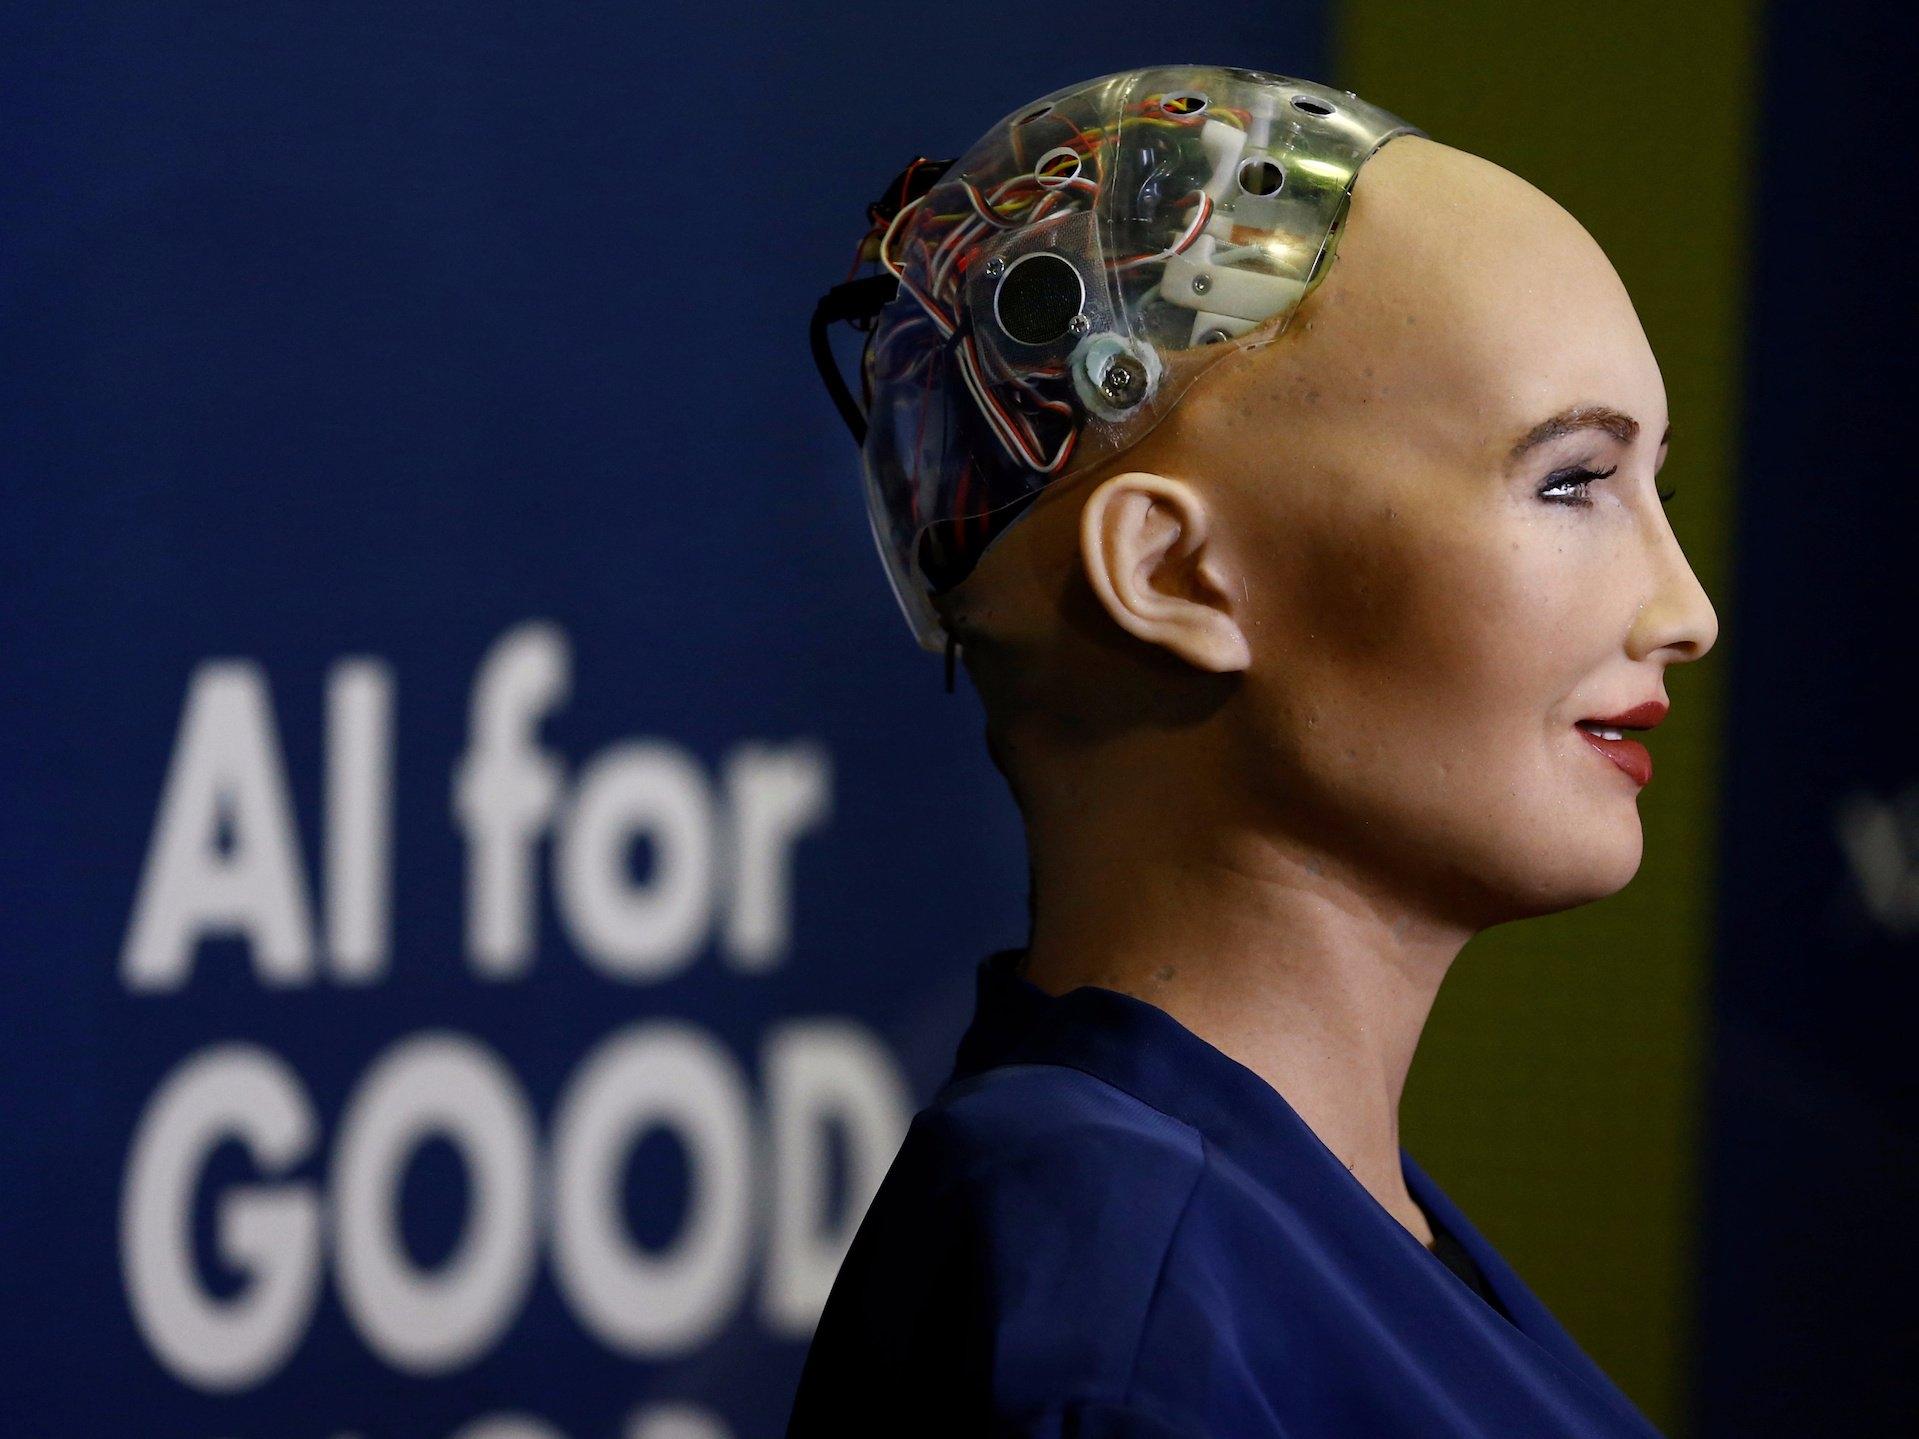 Meet Sophia, world's first robot with a citizenship